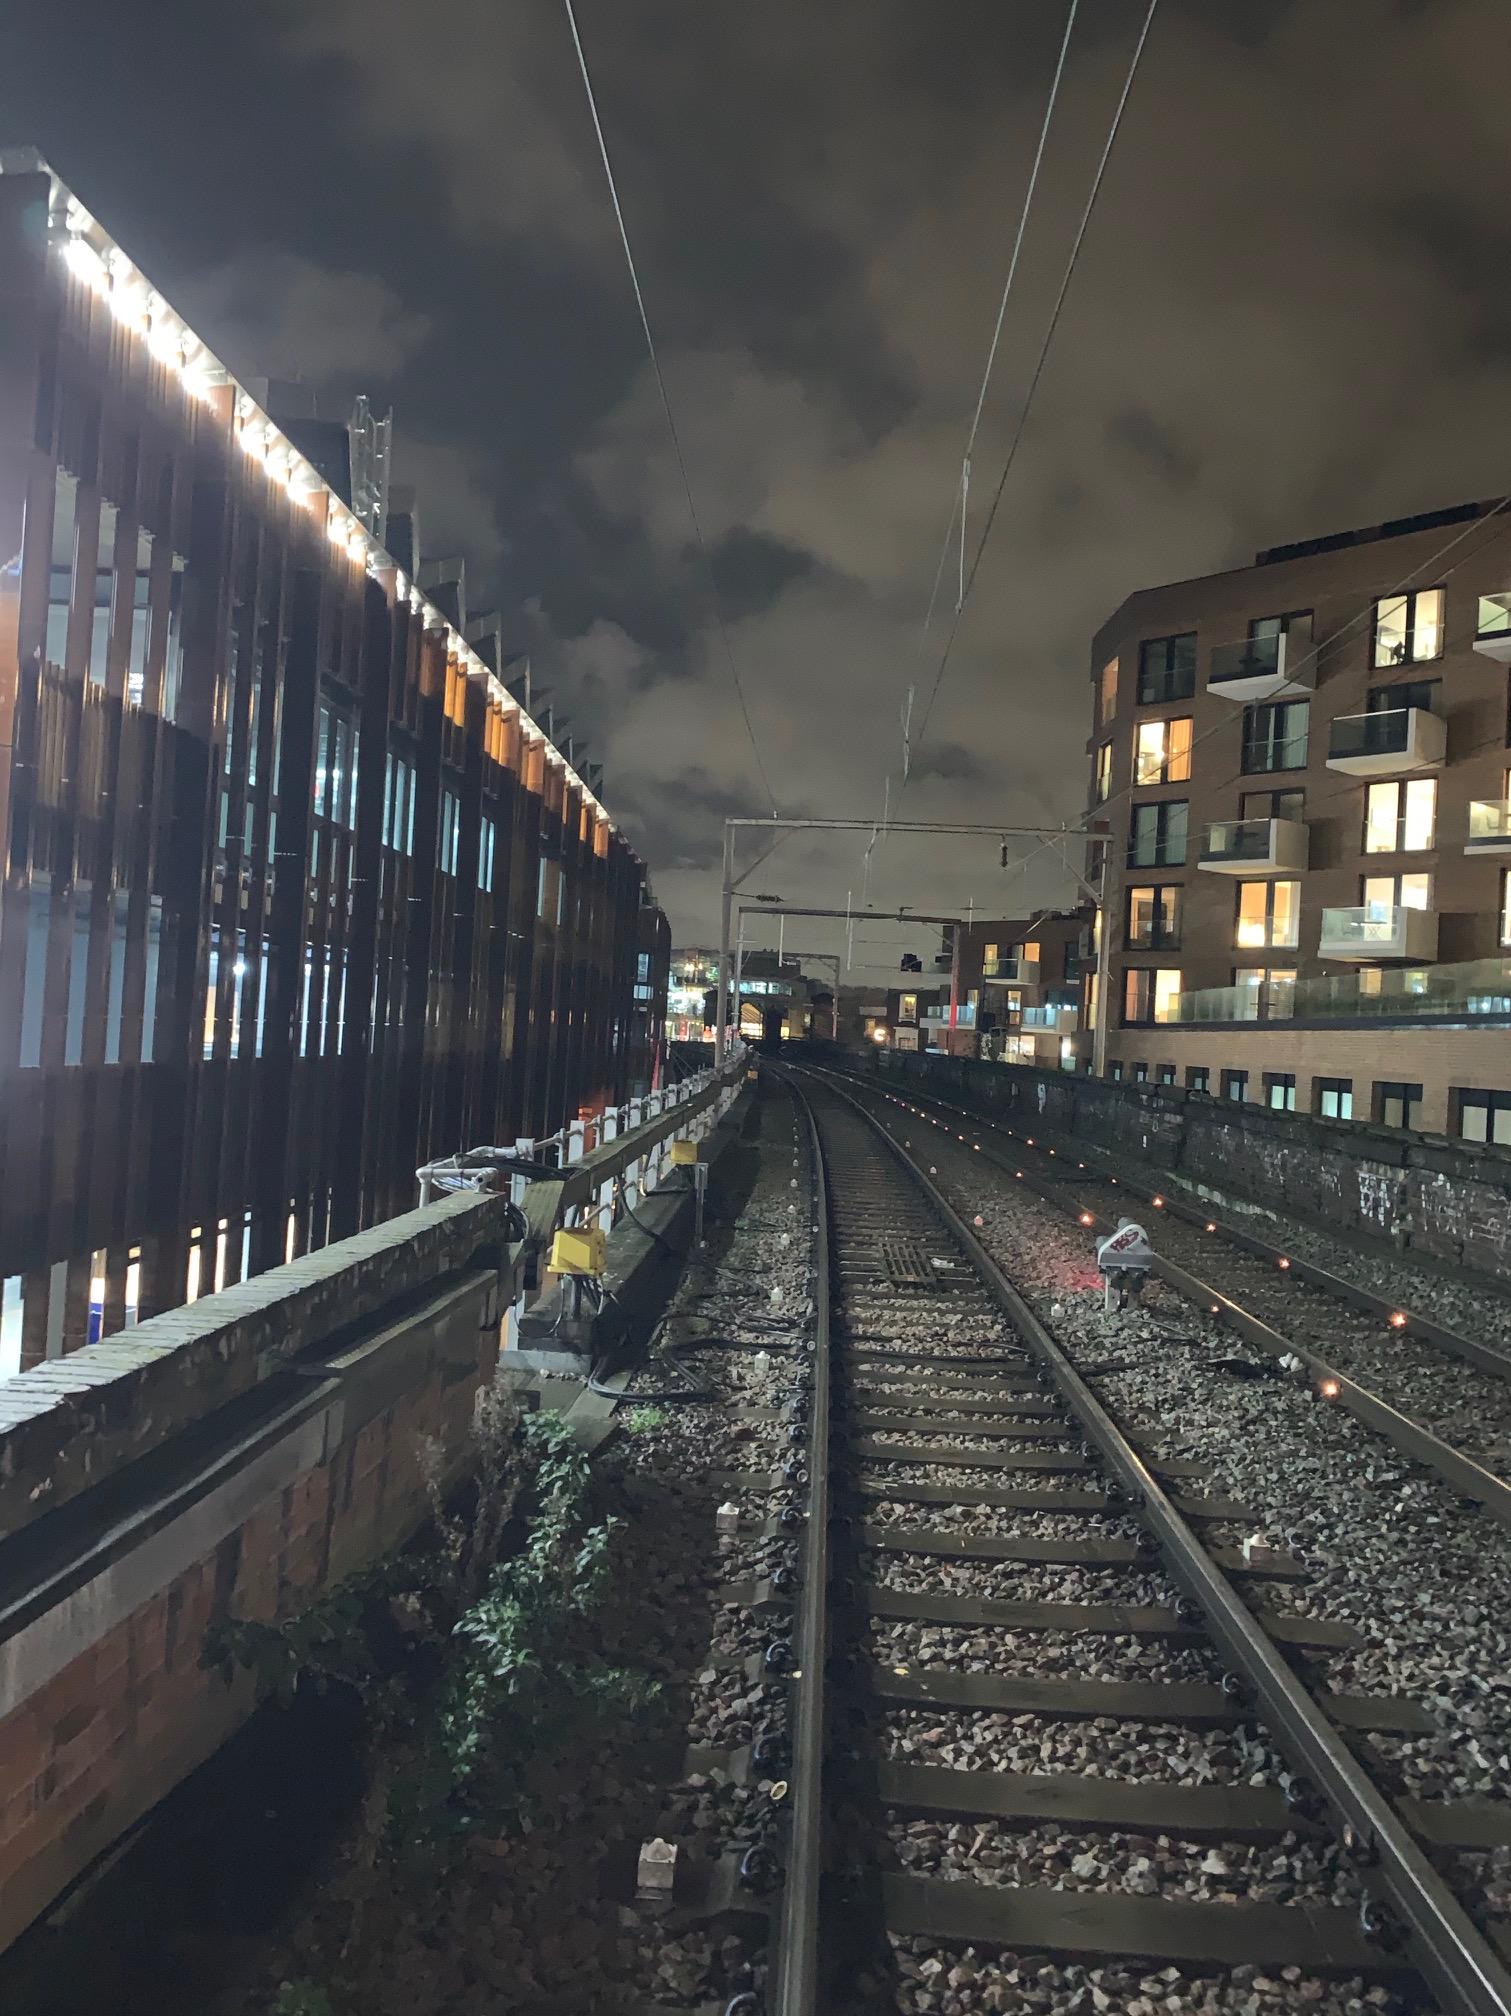 giorail.uk trackside with gioconda